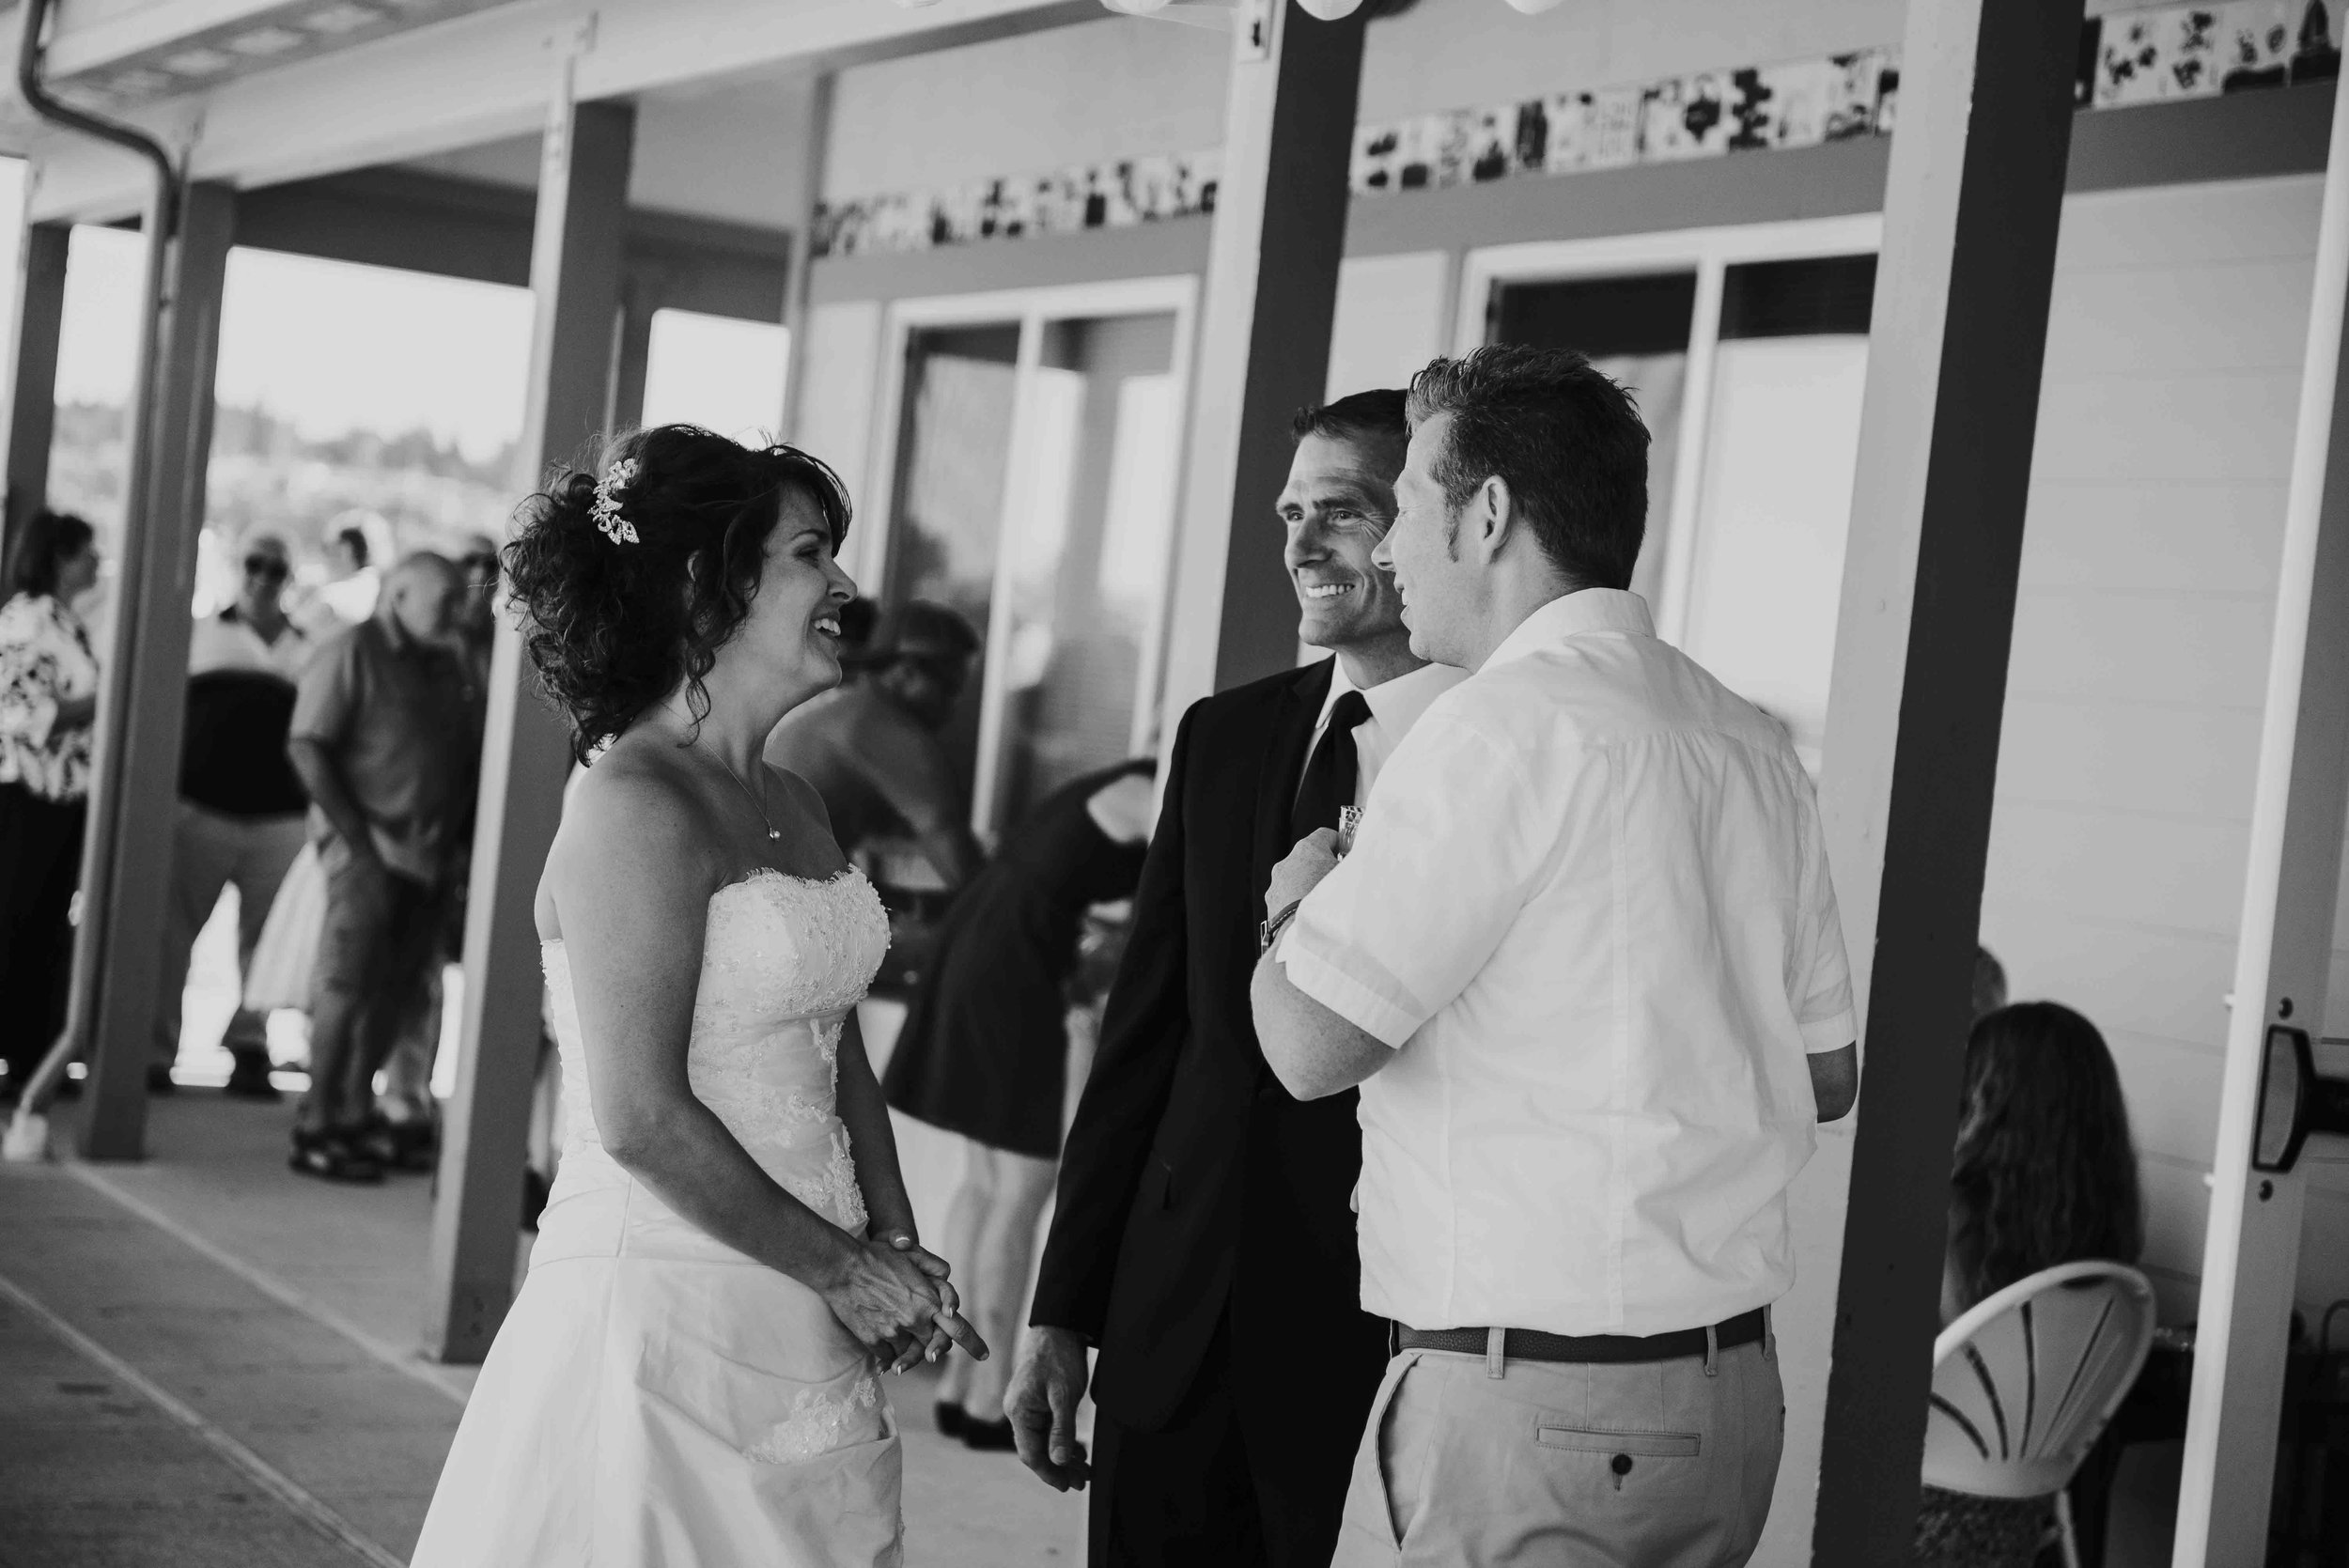 Cap-Sante-Wedding-J-Hodges-Anacortes-51.jpg